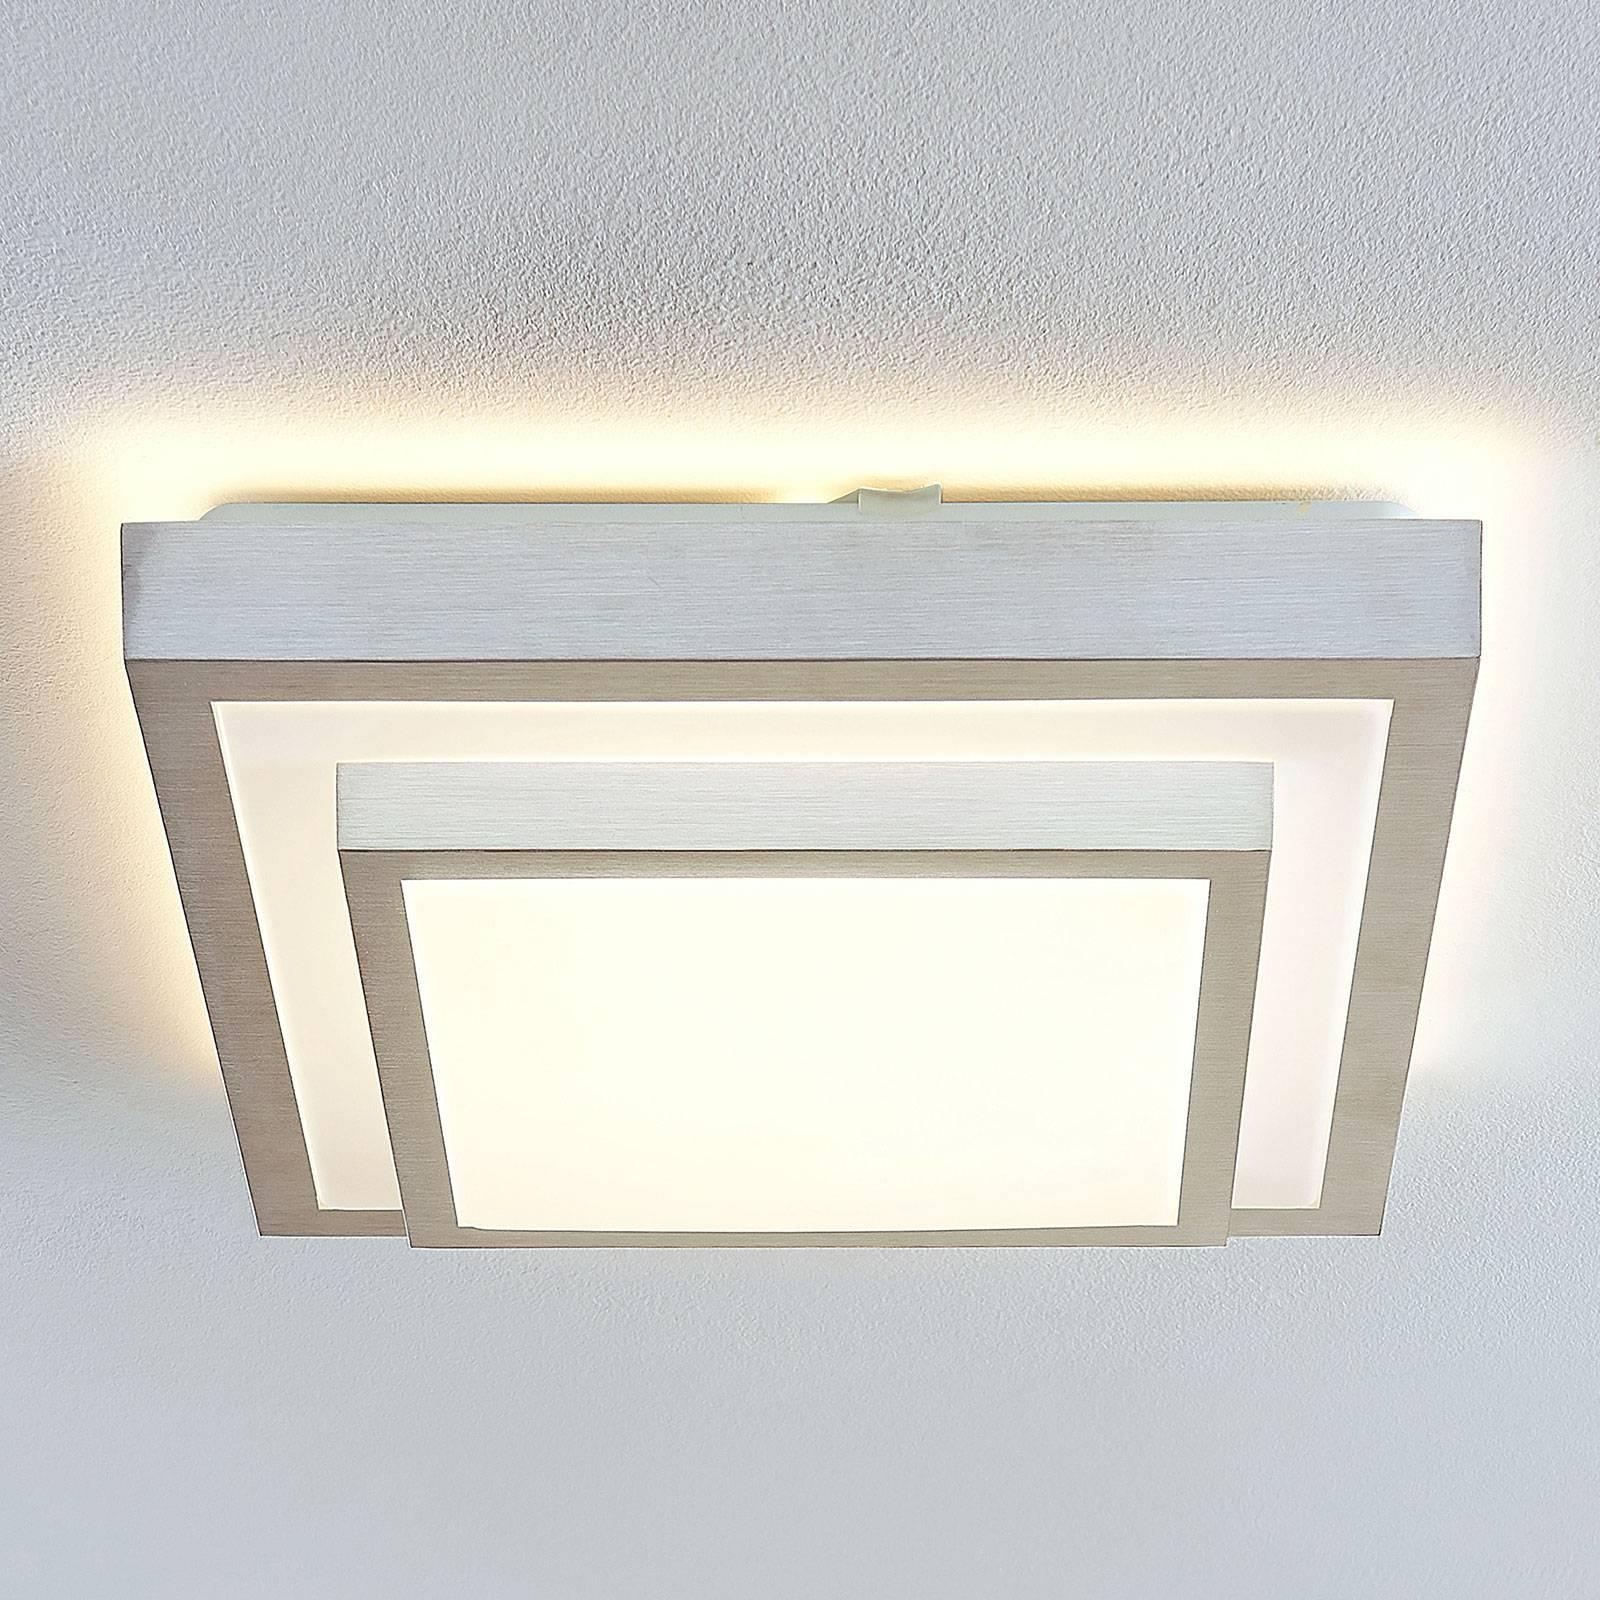 Lindby Mirco LED -kattovalaisin kulmikas, 37,5 cm